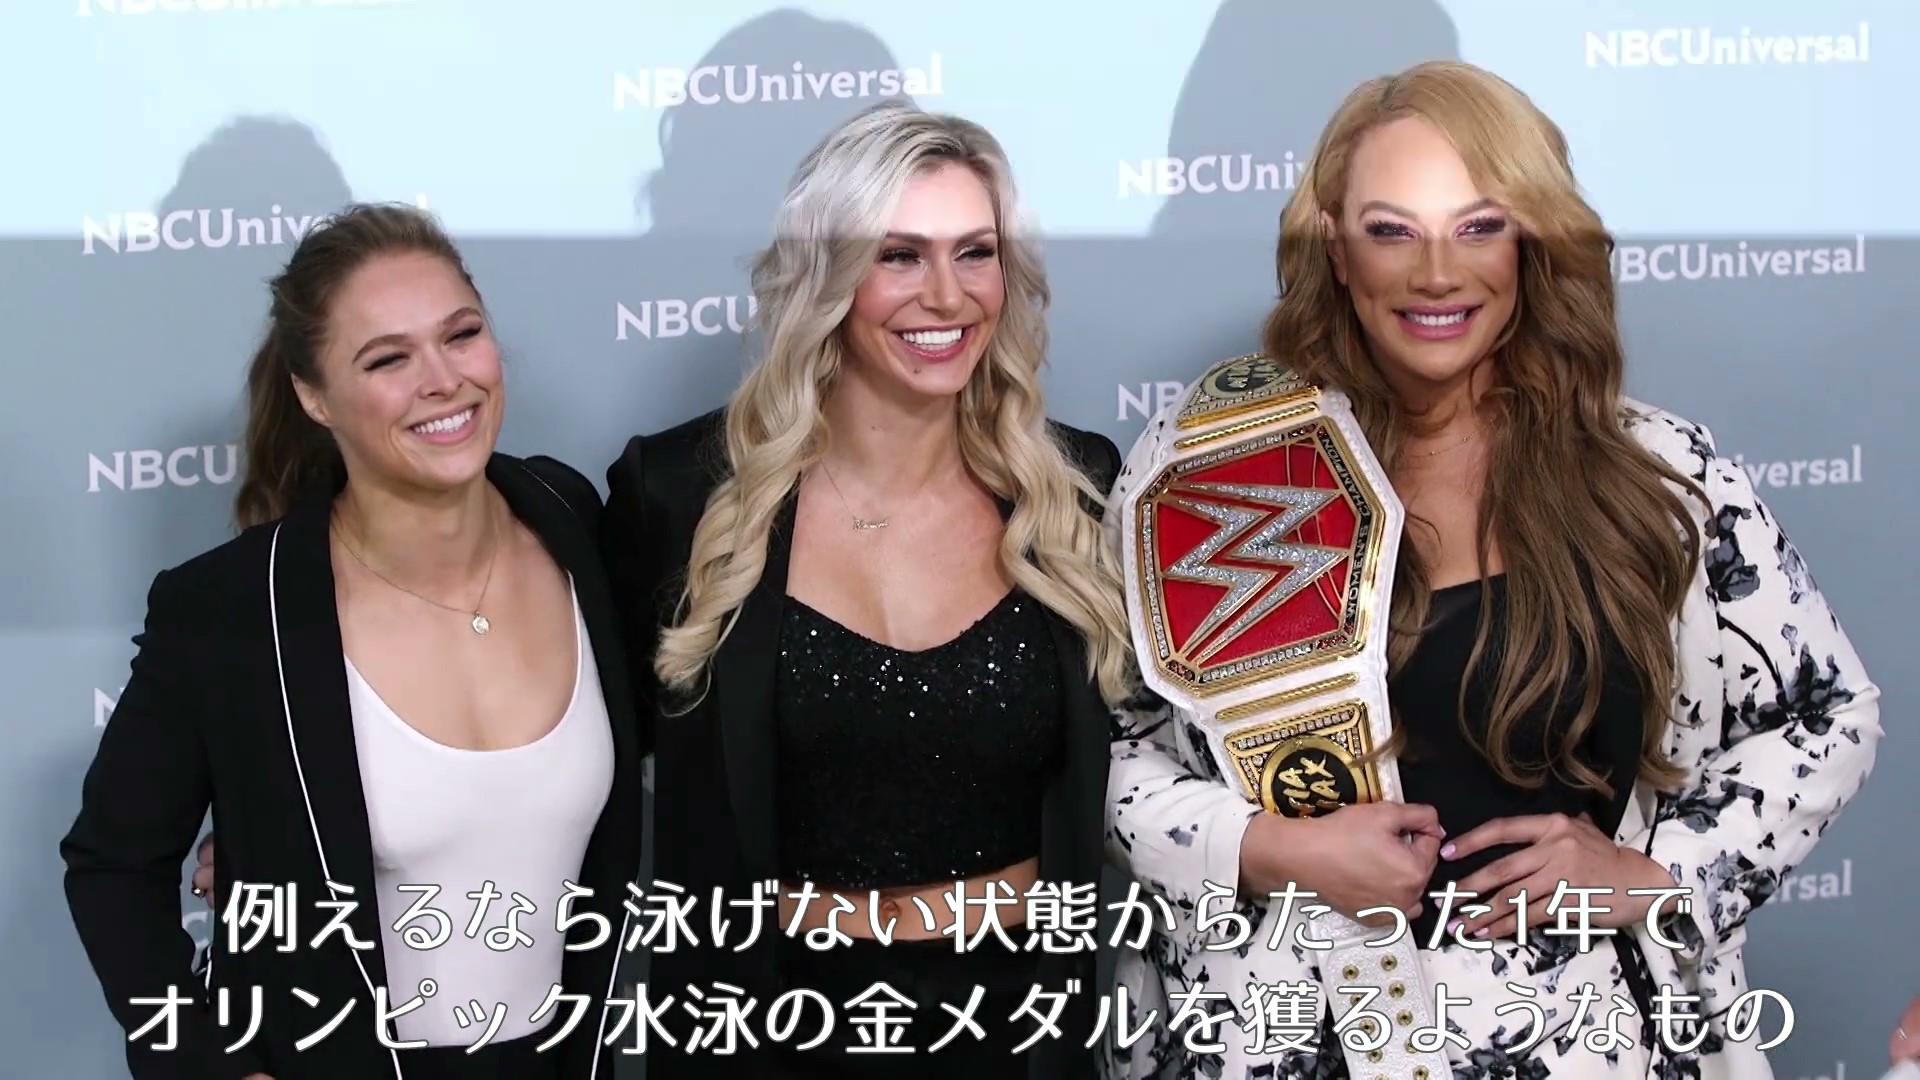 【UFC】初代女子バンタム級王者にして殿堂入りも果たしたロンダ・ラウジーの「今」に迫る!